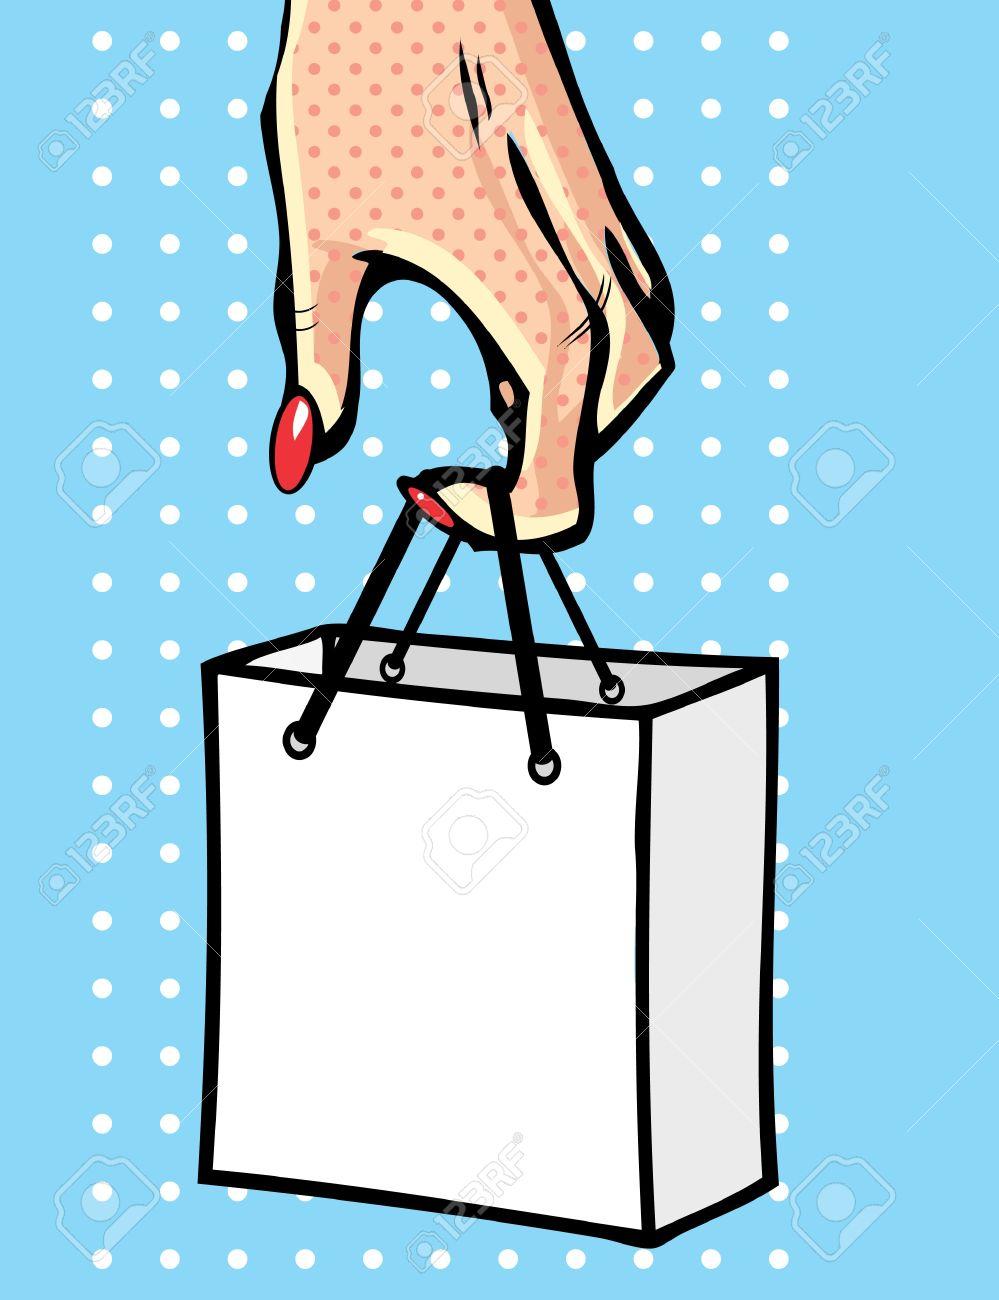 Pop art comic book symbol - Hand with bag. Woman Stock Vector - 9885257